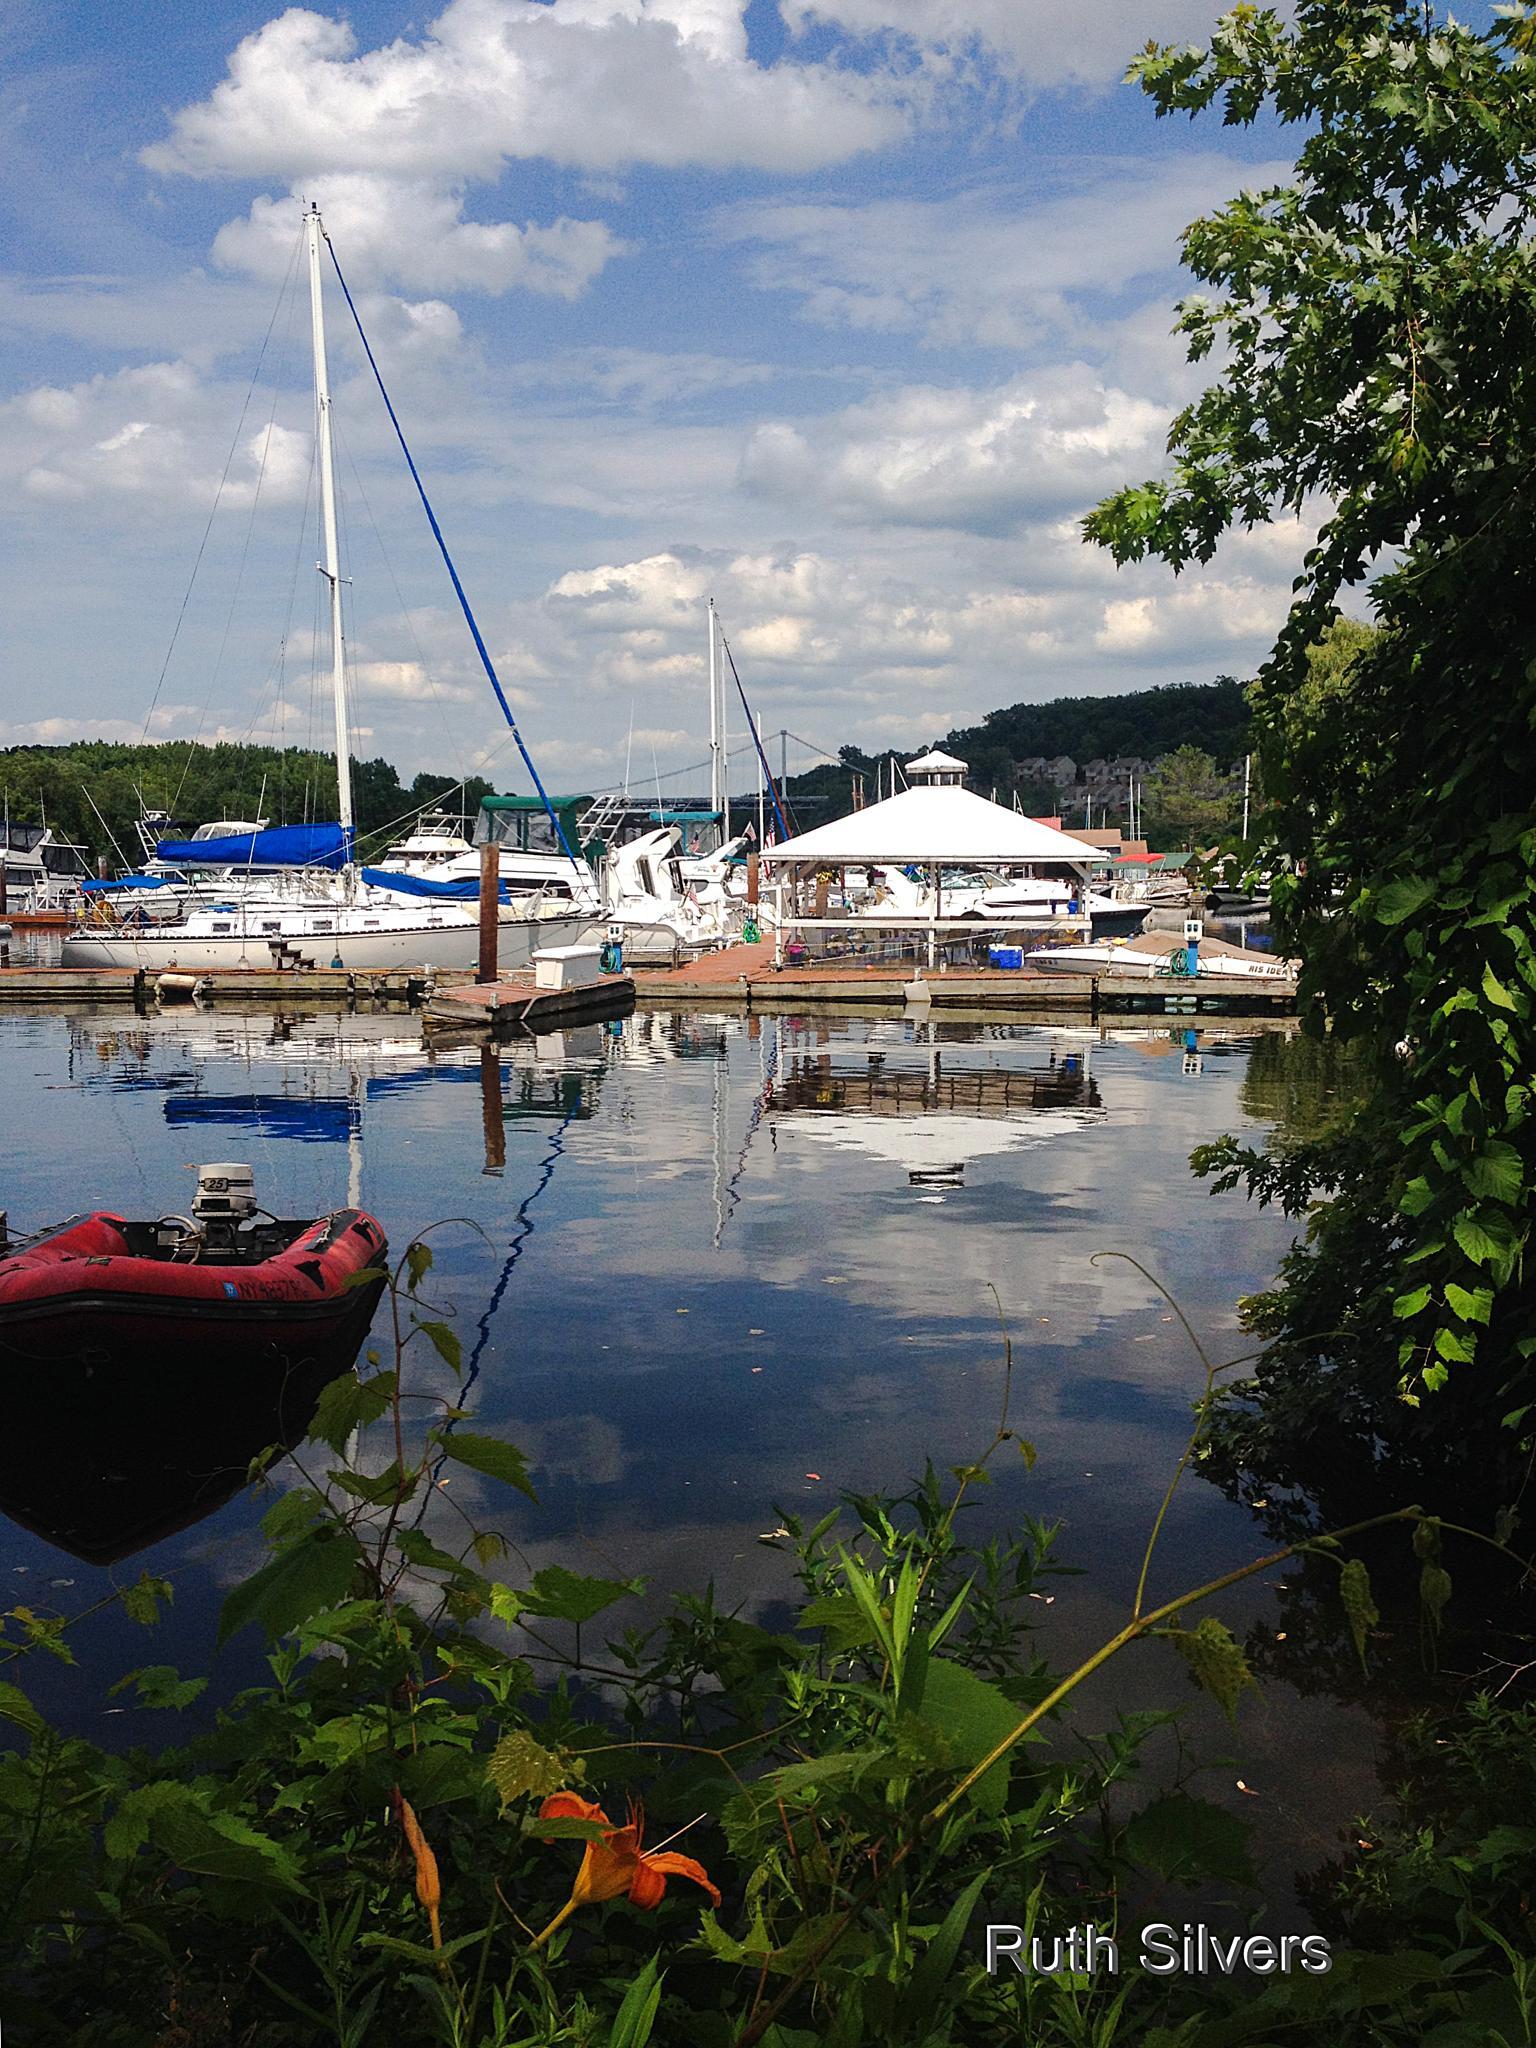 Summer at the marina by Ruth Silvers